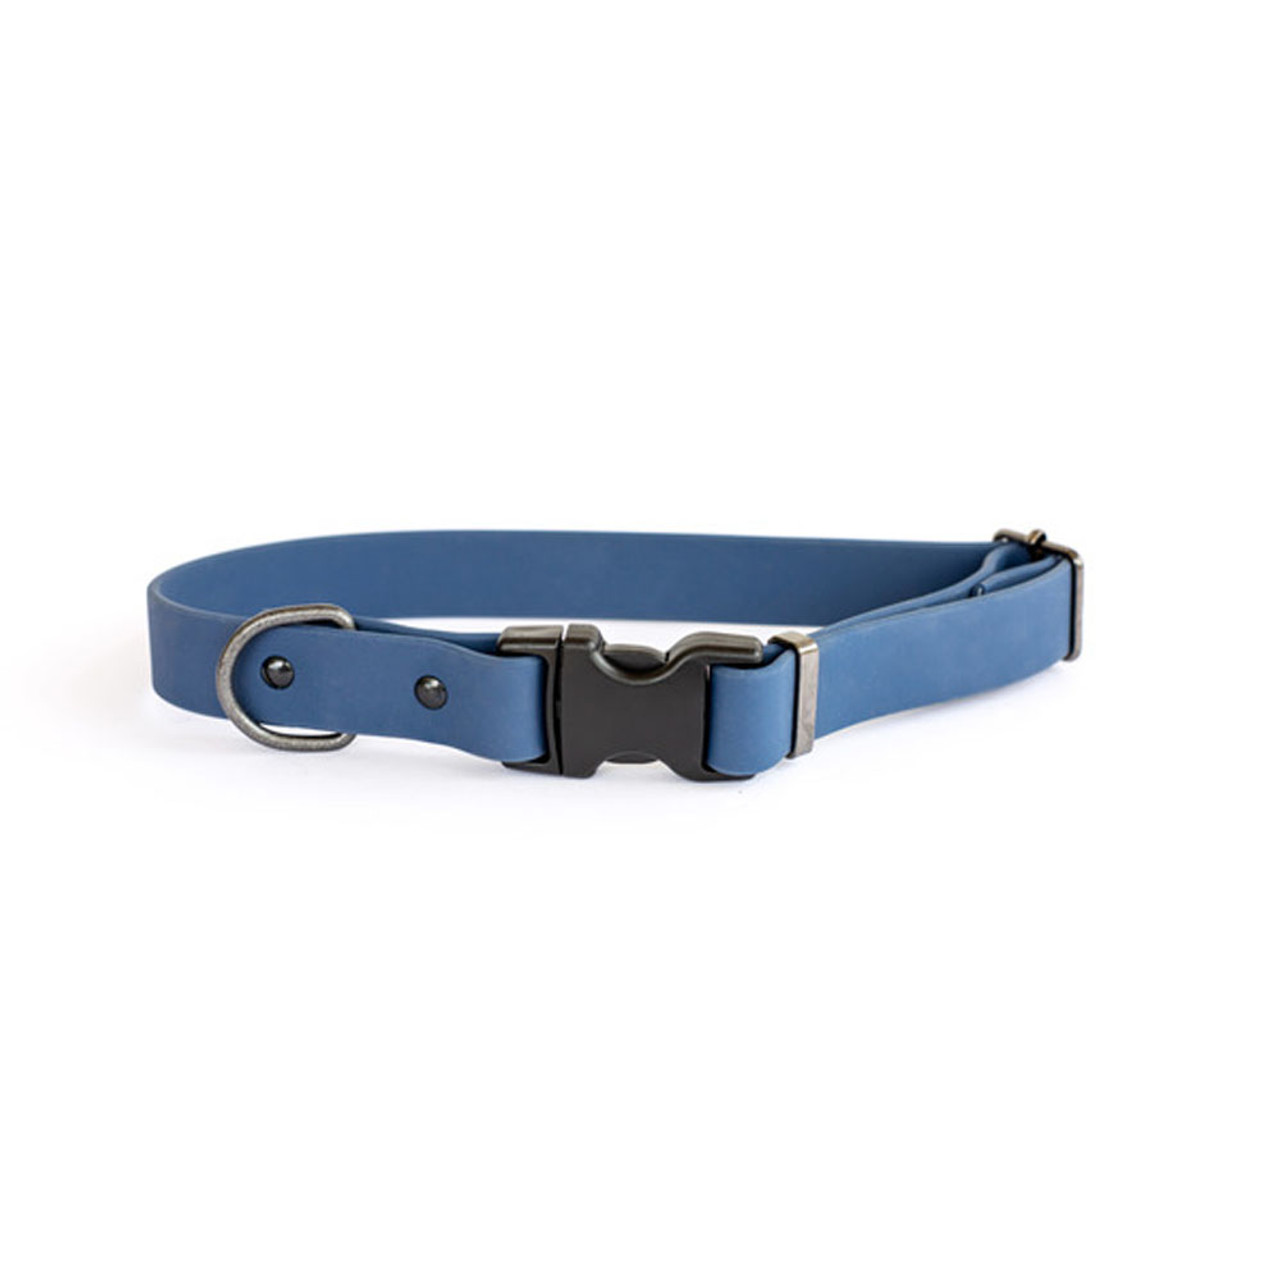 Classy Waterproof Soft PVC Coated Nylon Navy Dog Collar